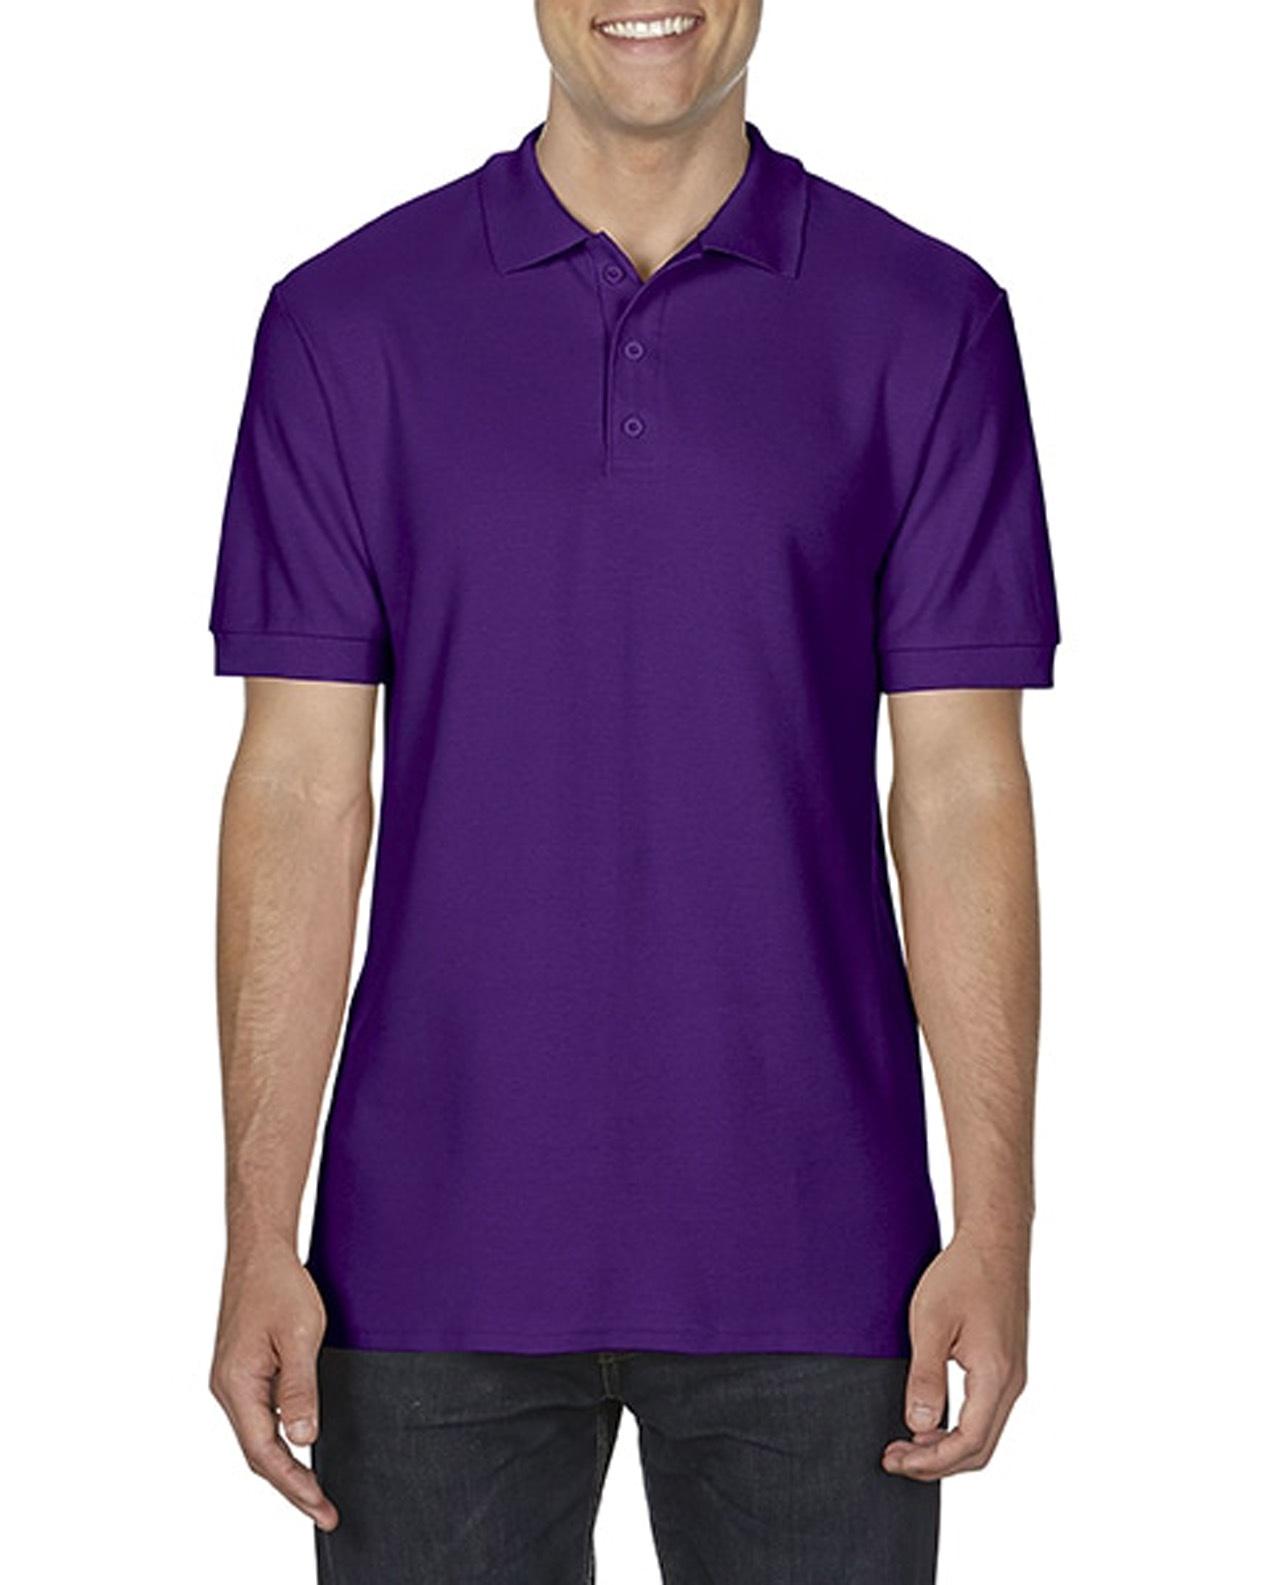 100 cotton Gildan polo shirt purple